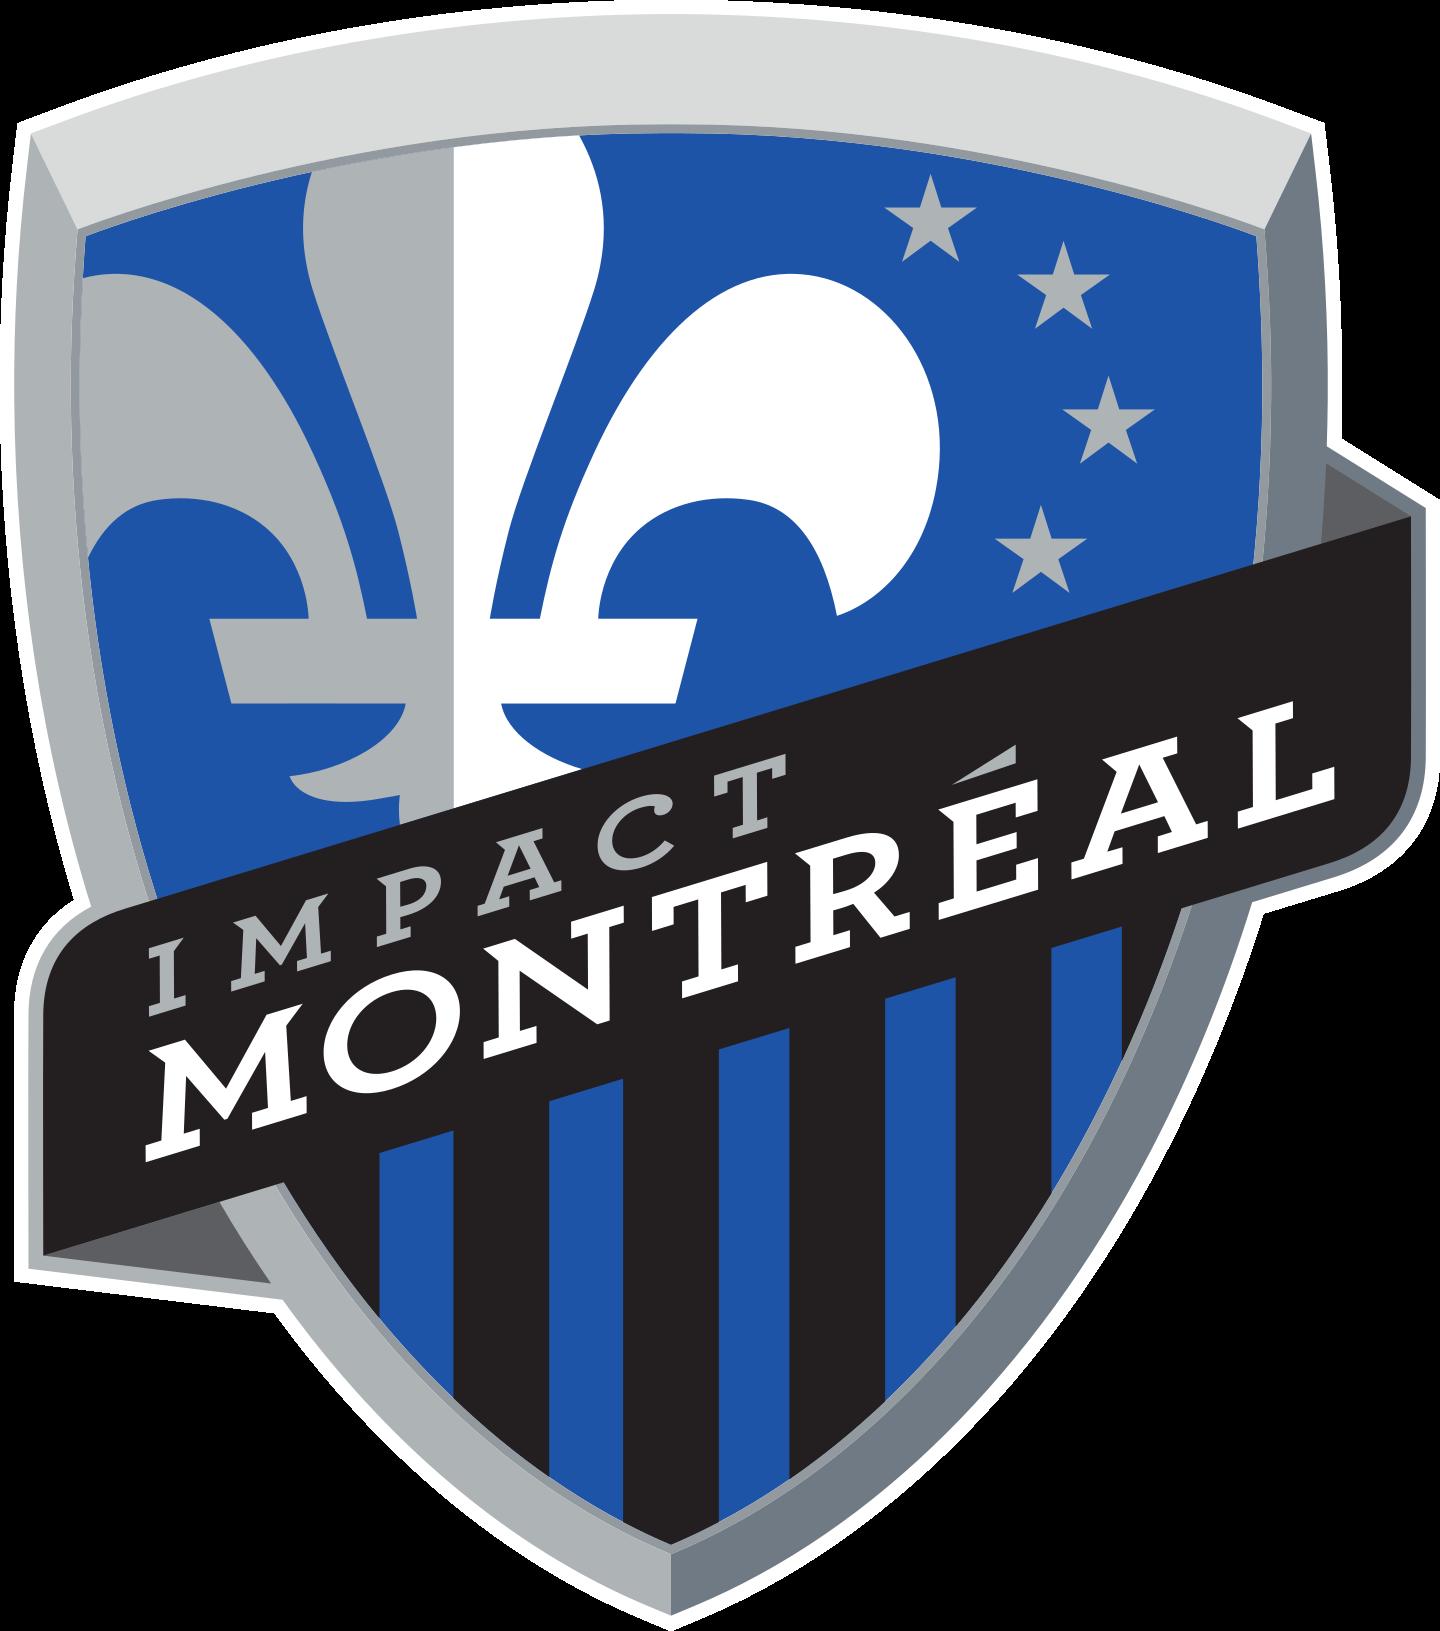 montreal impact logo 2 - Montreal Impact Logo